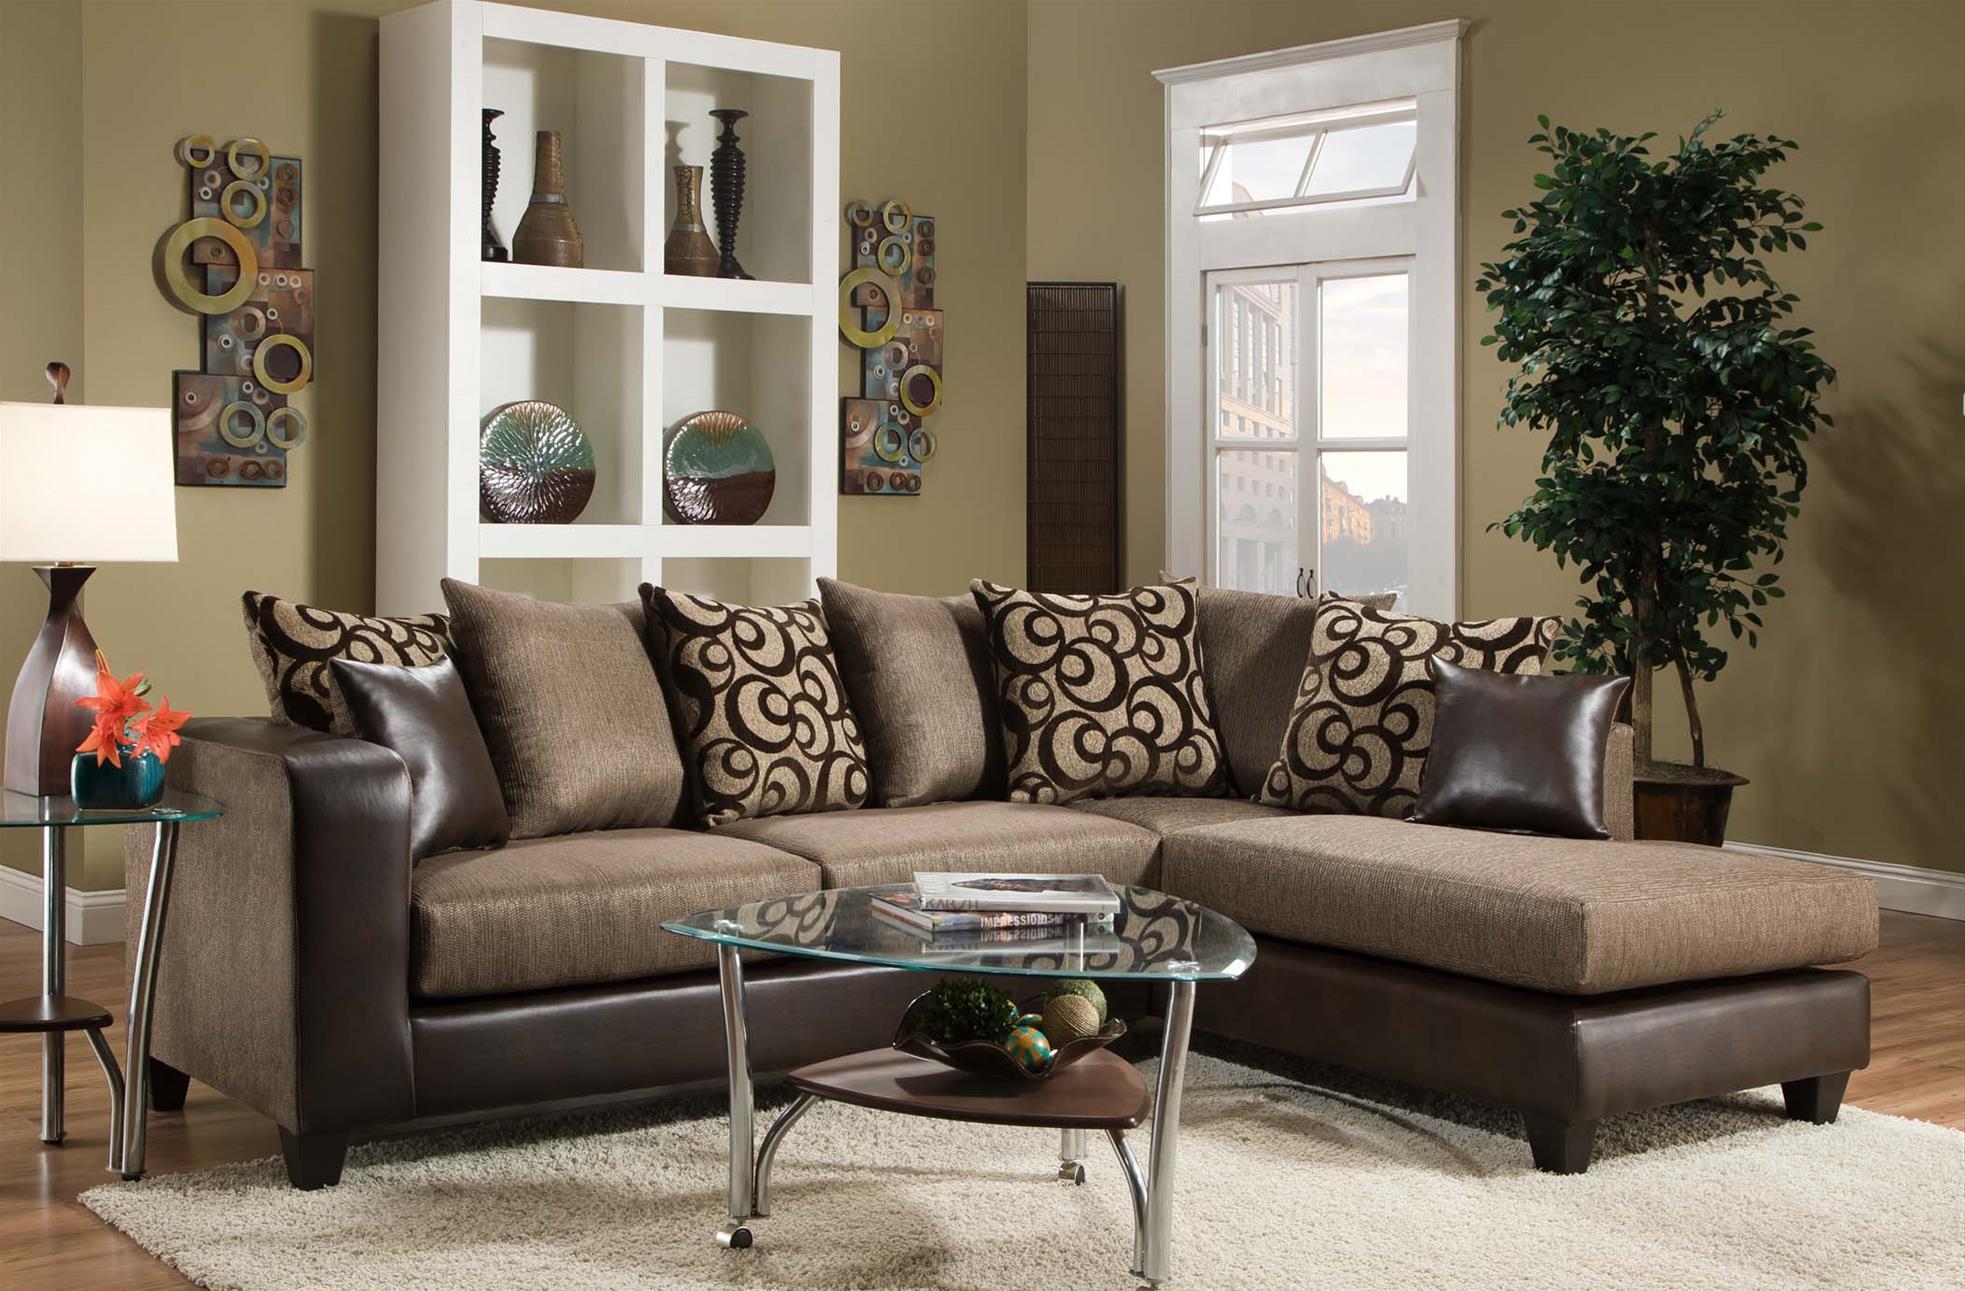 Delta Furniture Sofa 835 06 Royal Blue Living Room ly 579 95